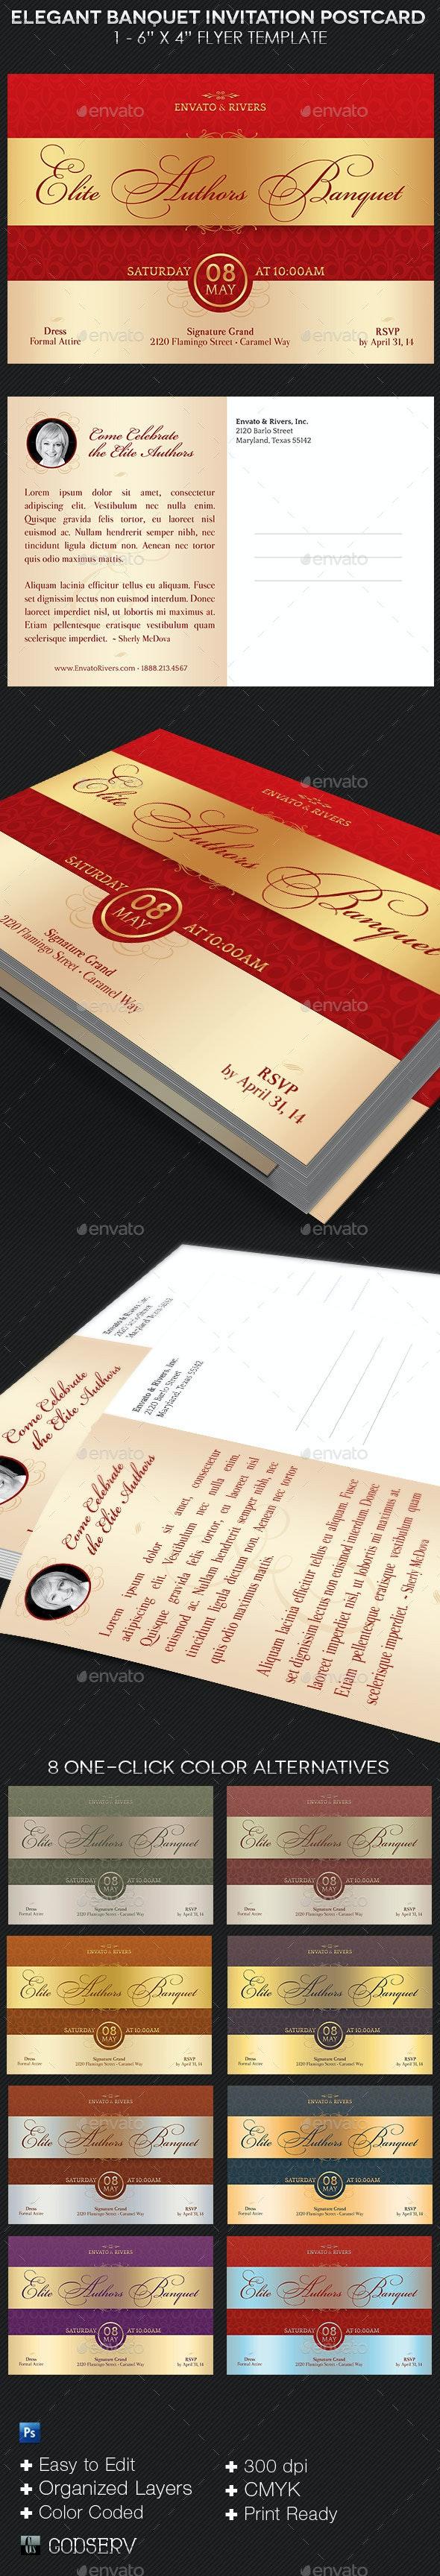 Elegant Banquet Invitation Postcard Template - Invitations Cards & Invites